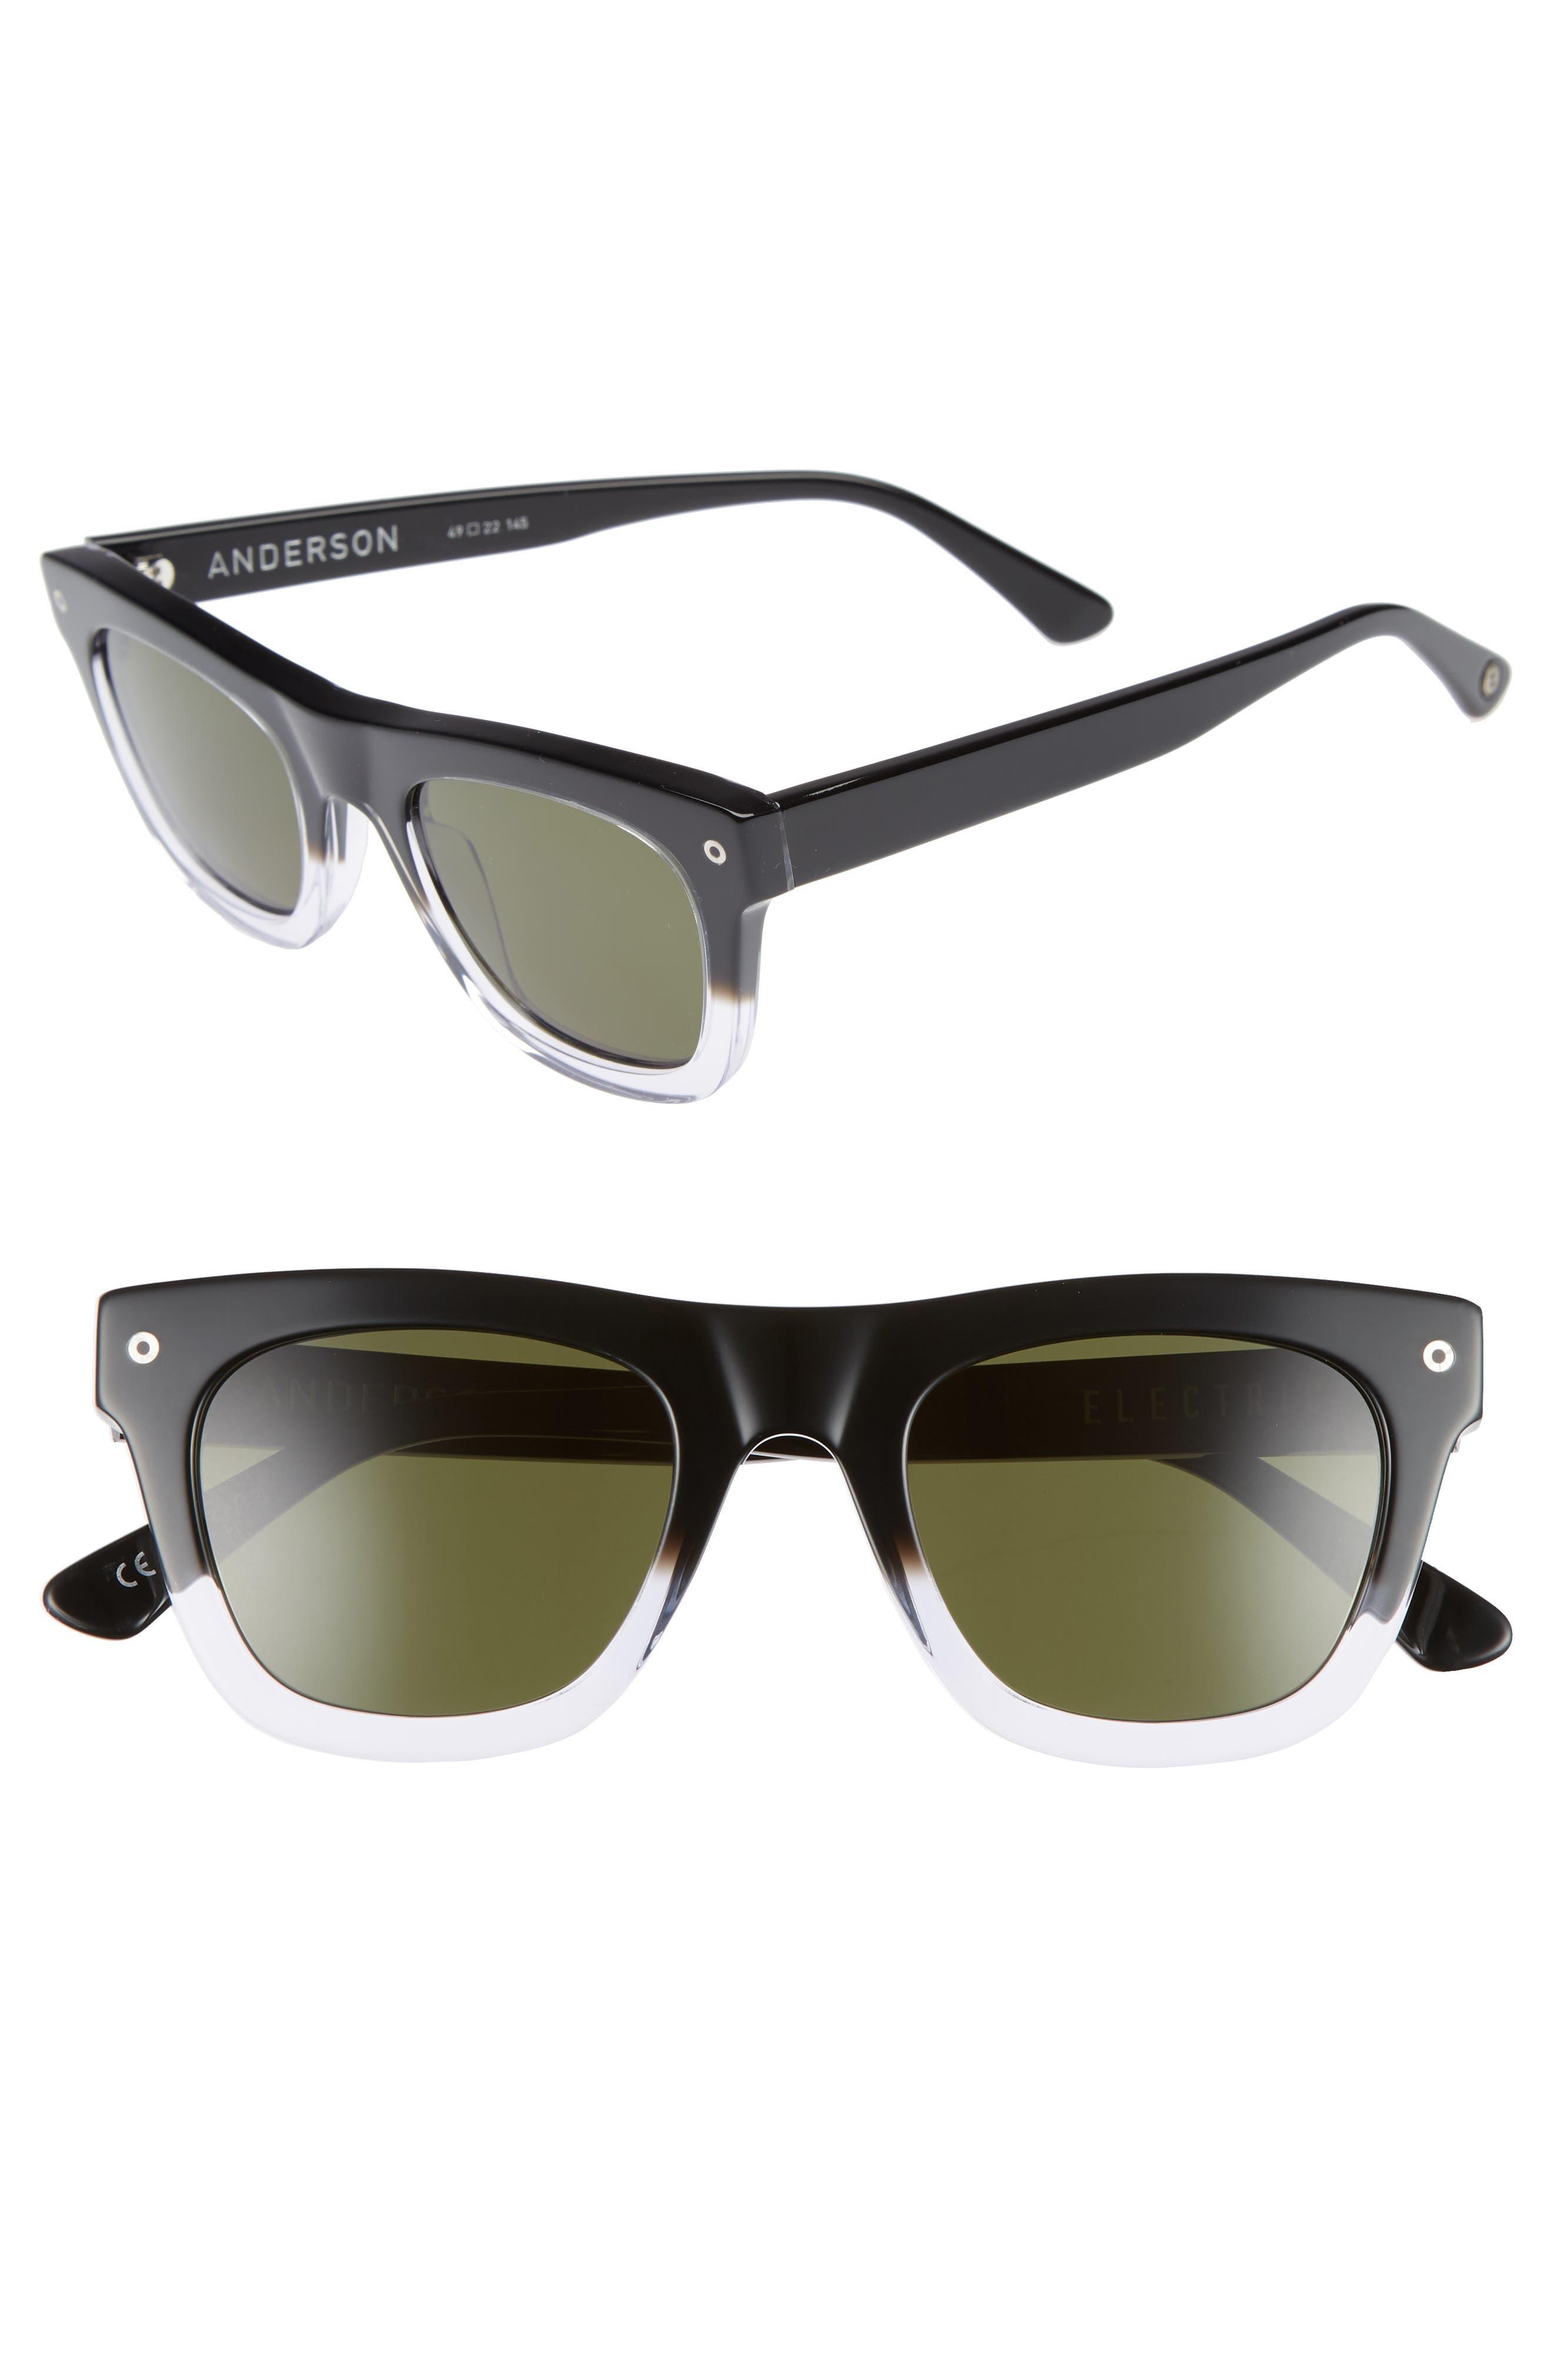 Electric Andersen 49mm Sunglasses